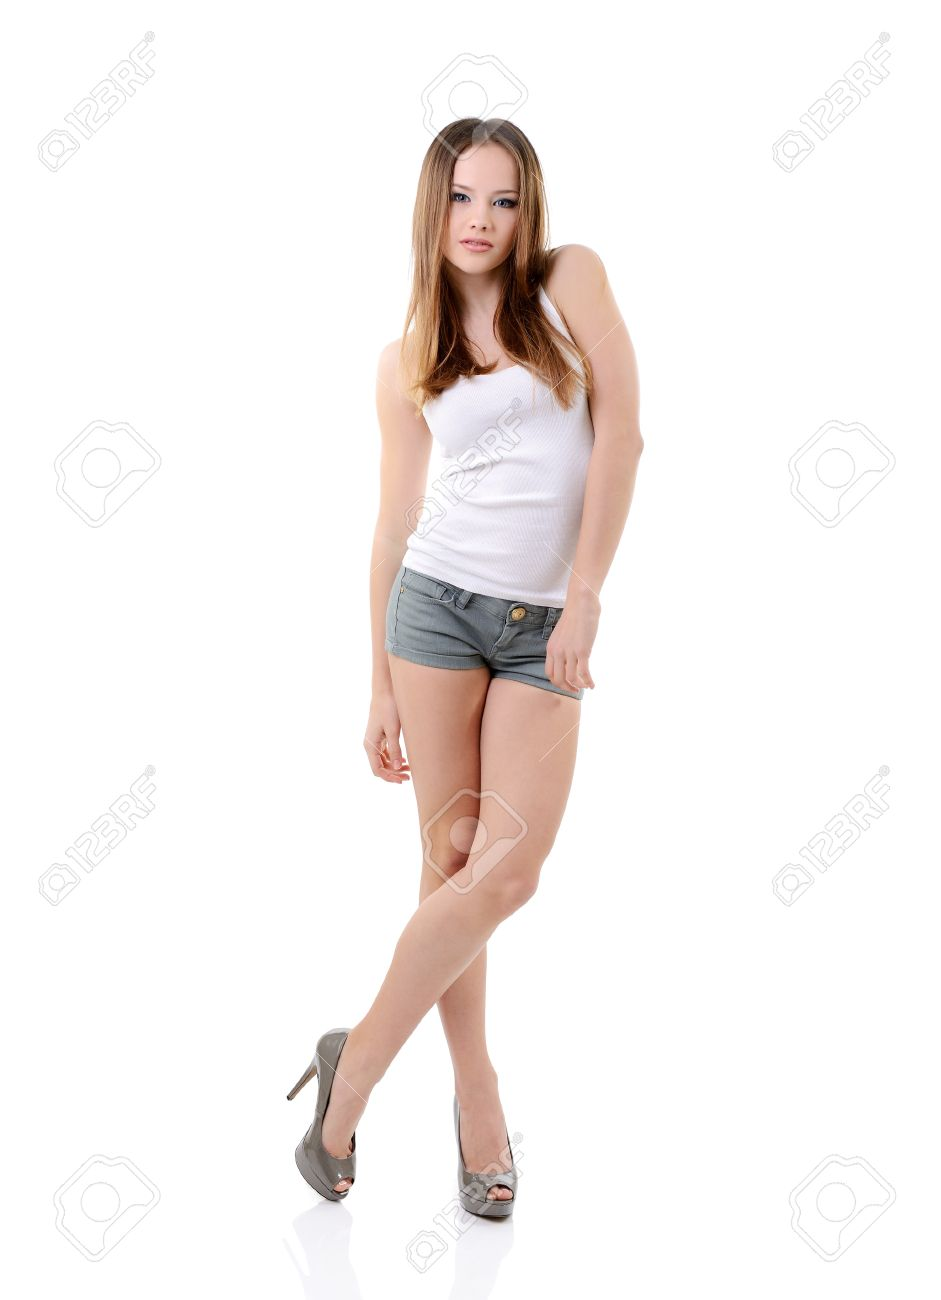 Chicks teen free teens full length